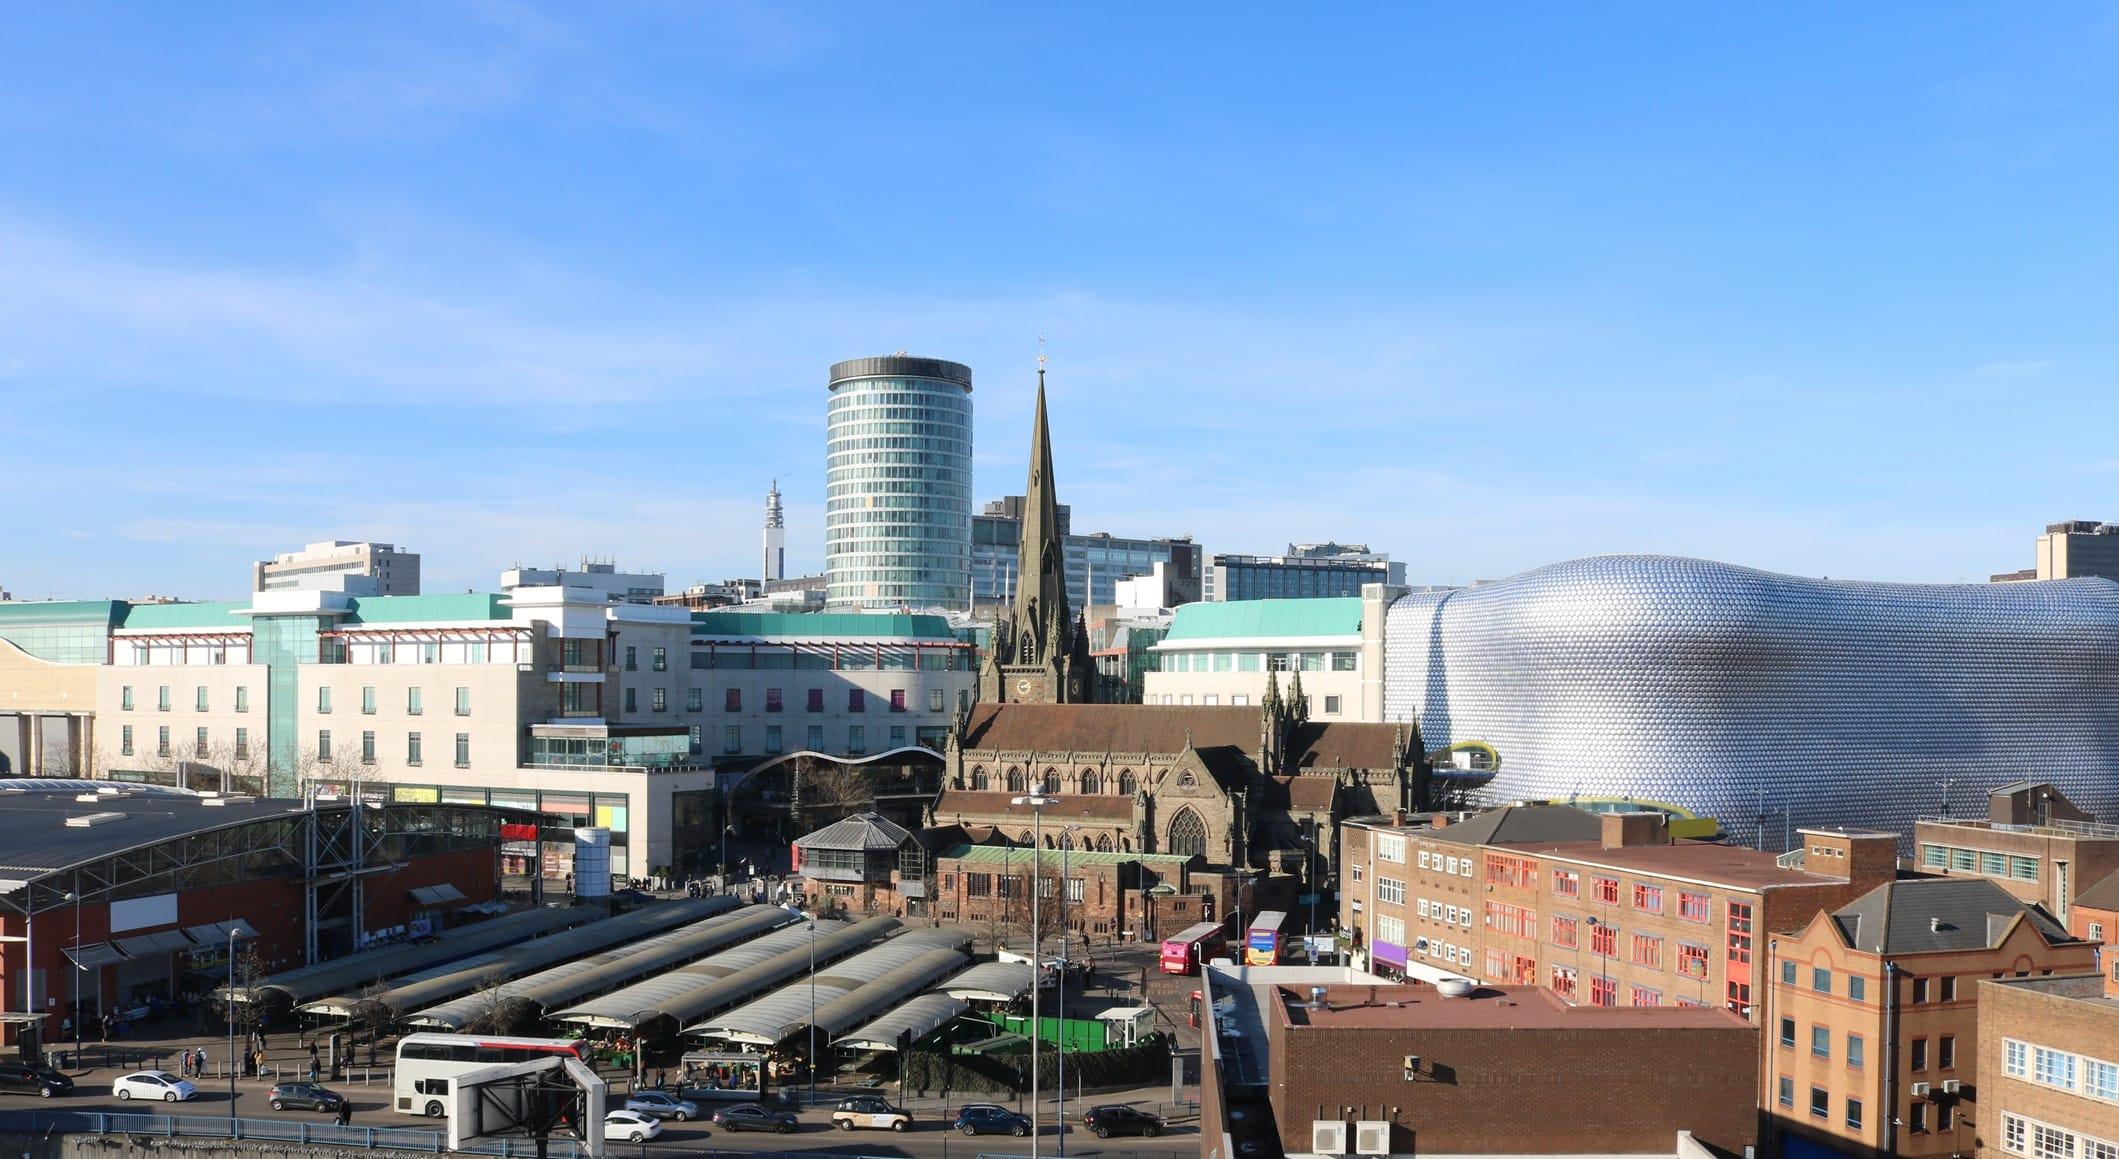 Birmingham UK skyline including Rag Market, St Martins Church, Rotunder and The Bullring